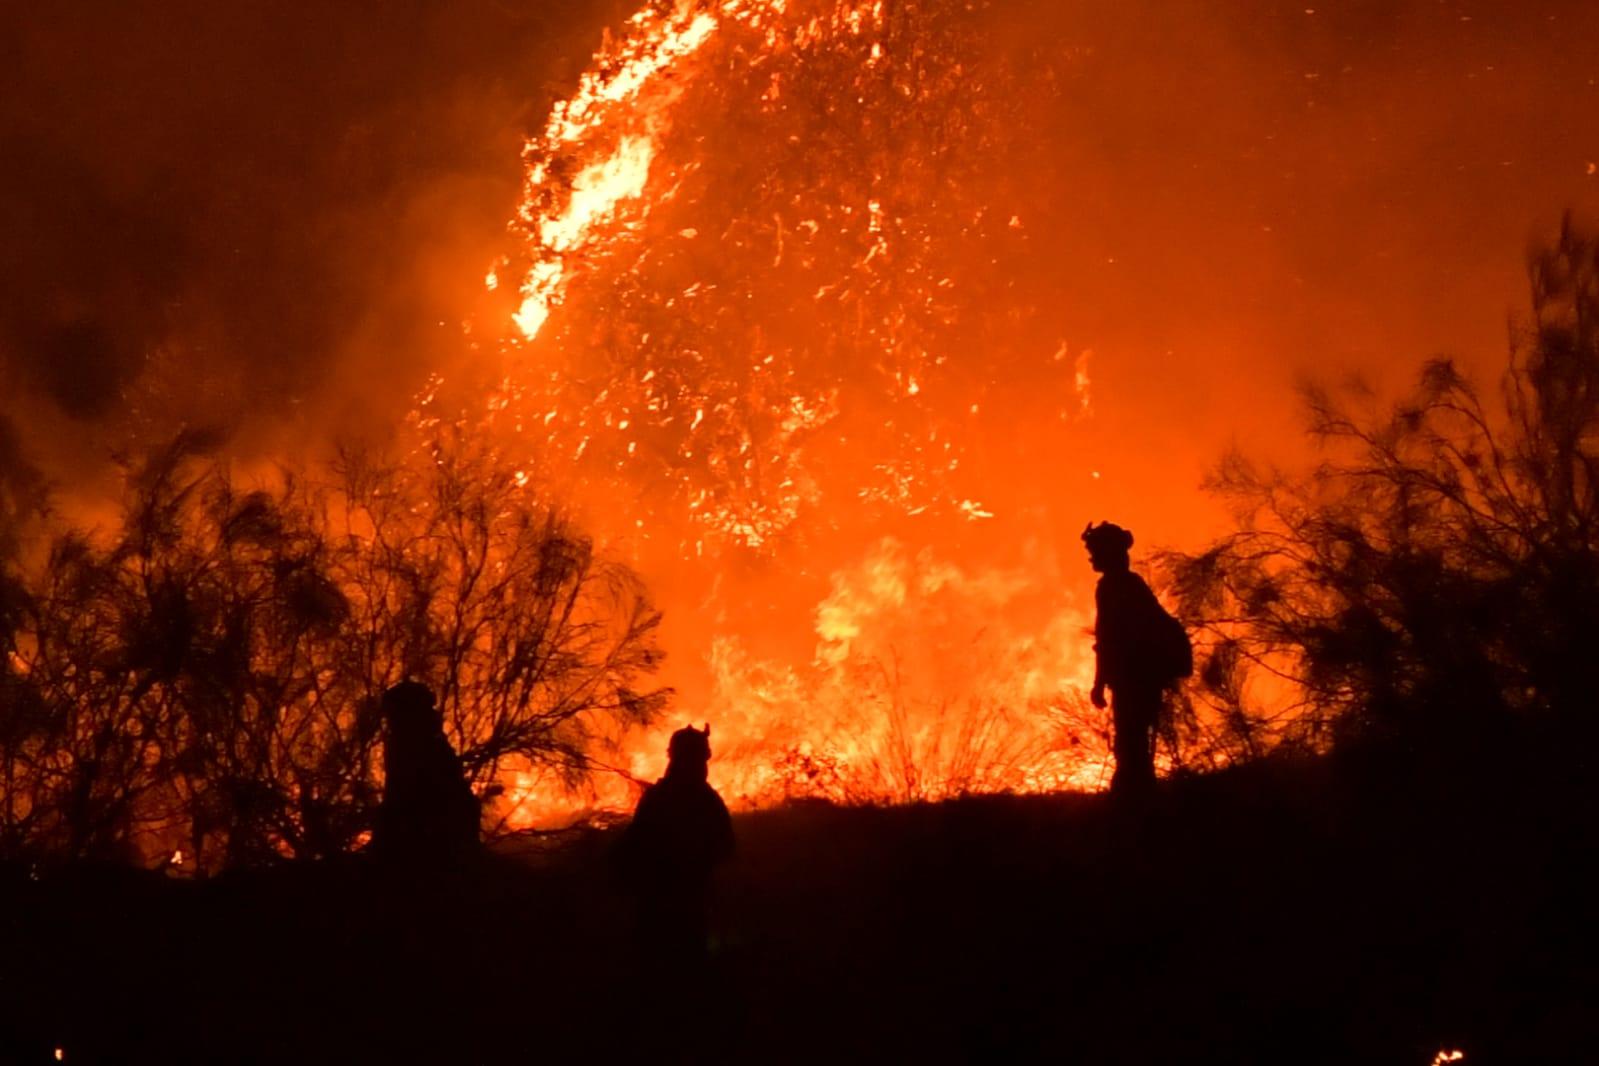 Incendio forestal Jun